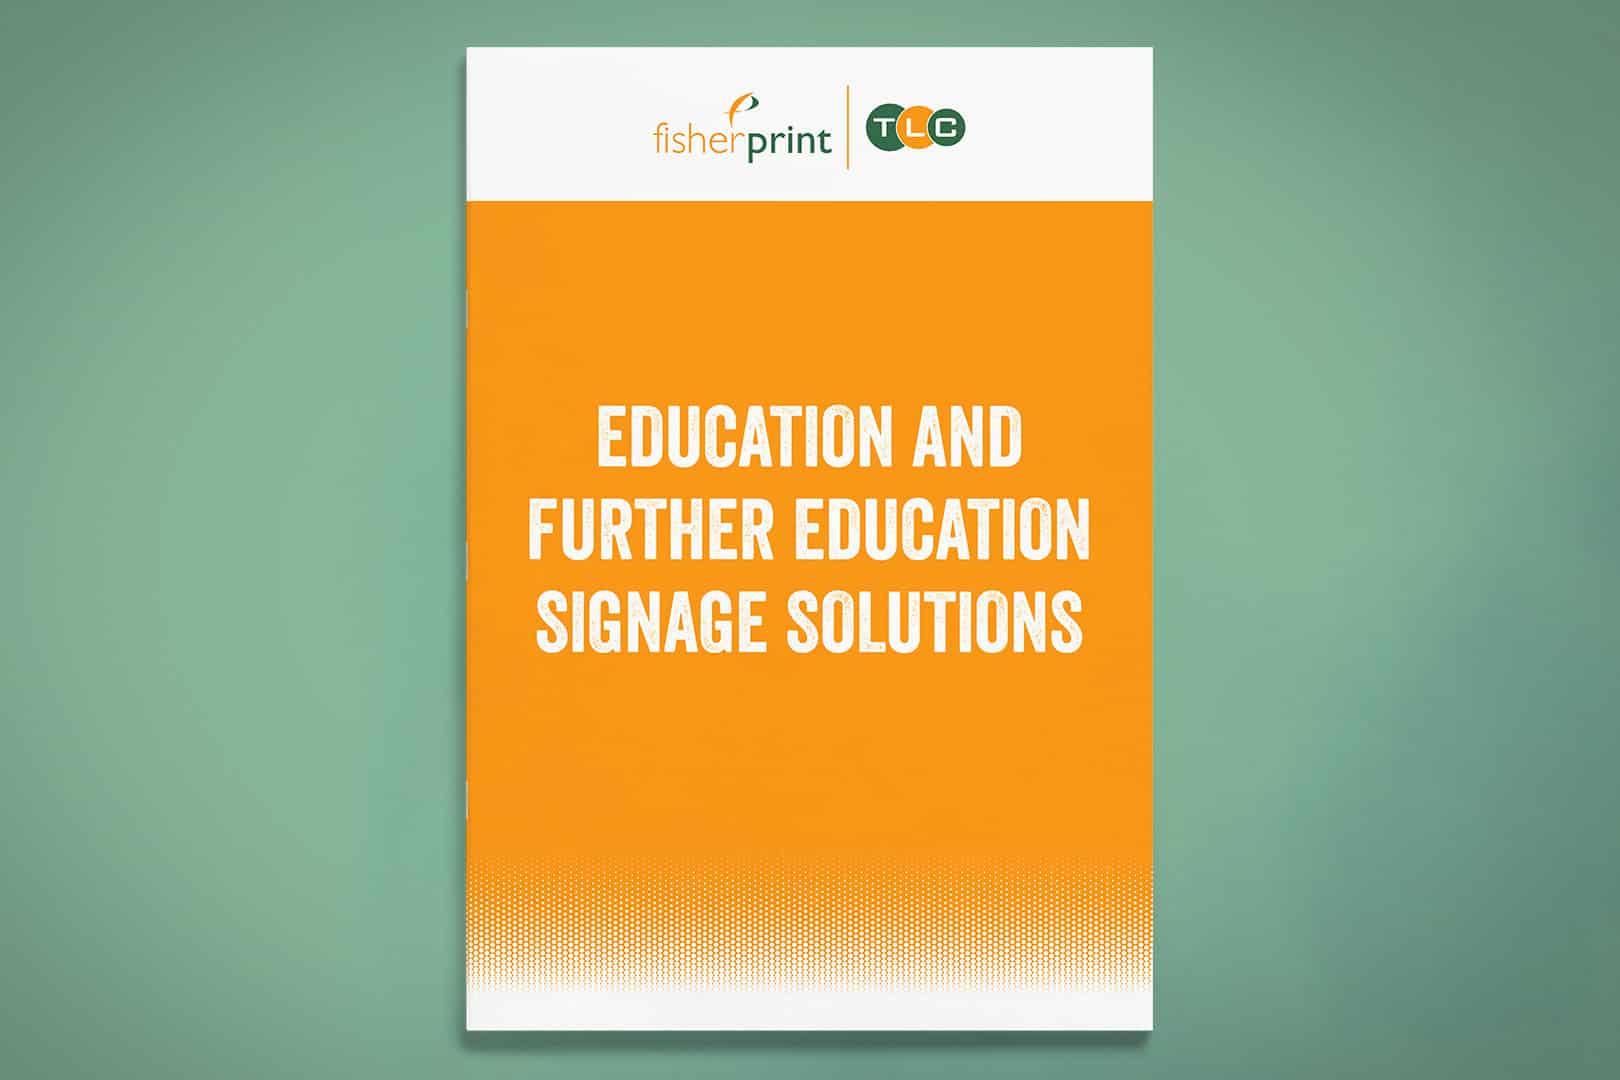 school and university signage